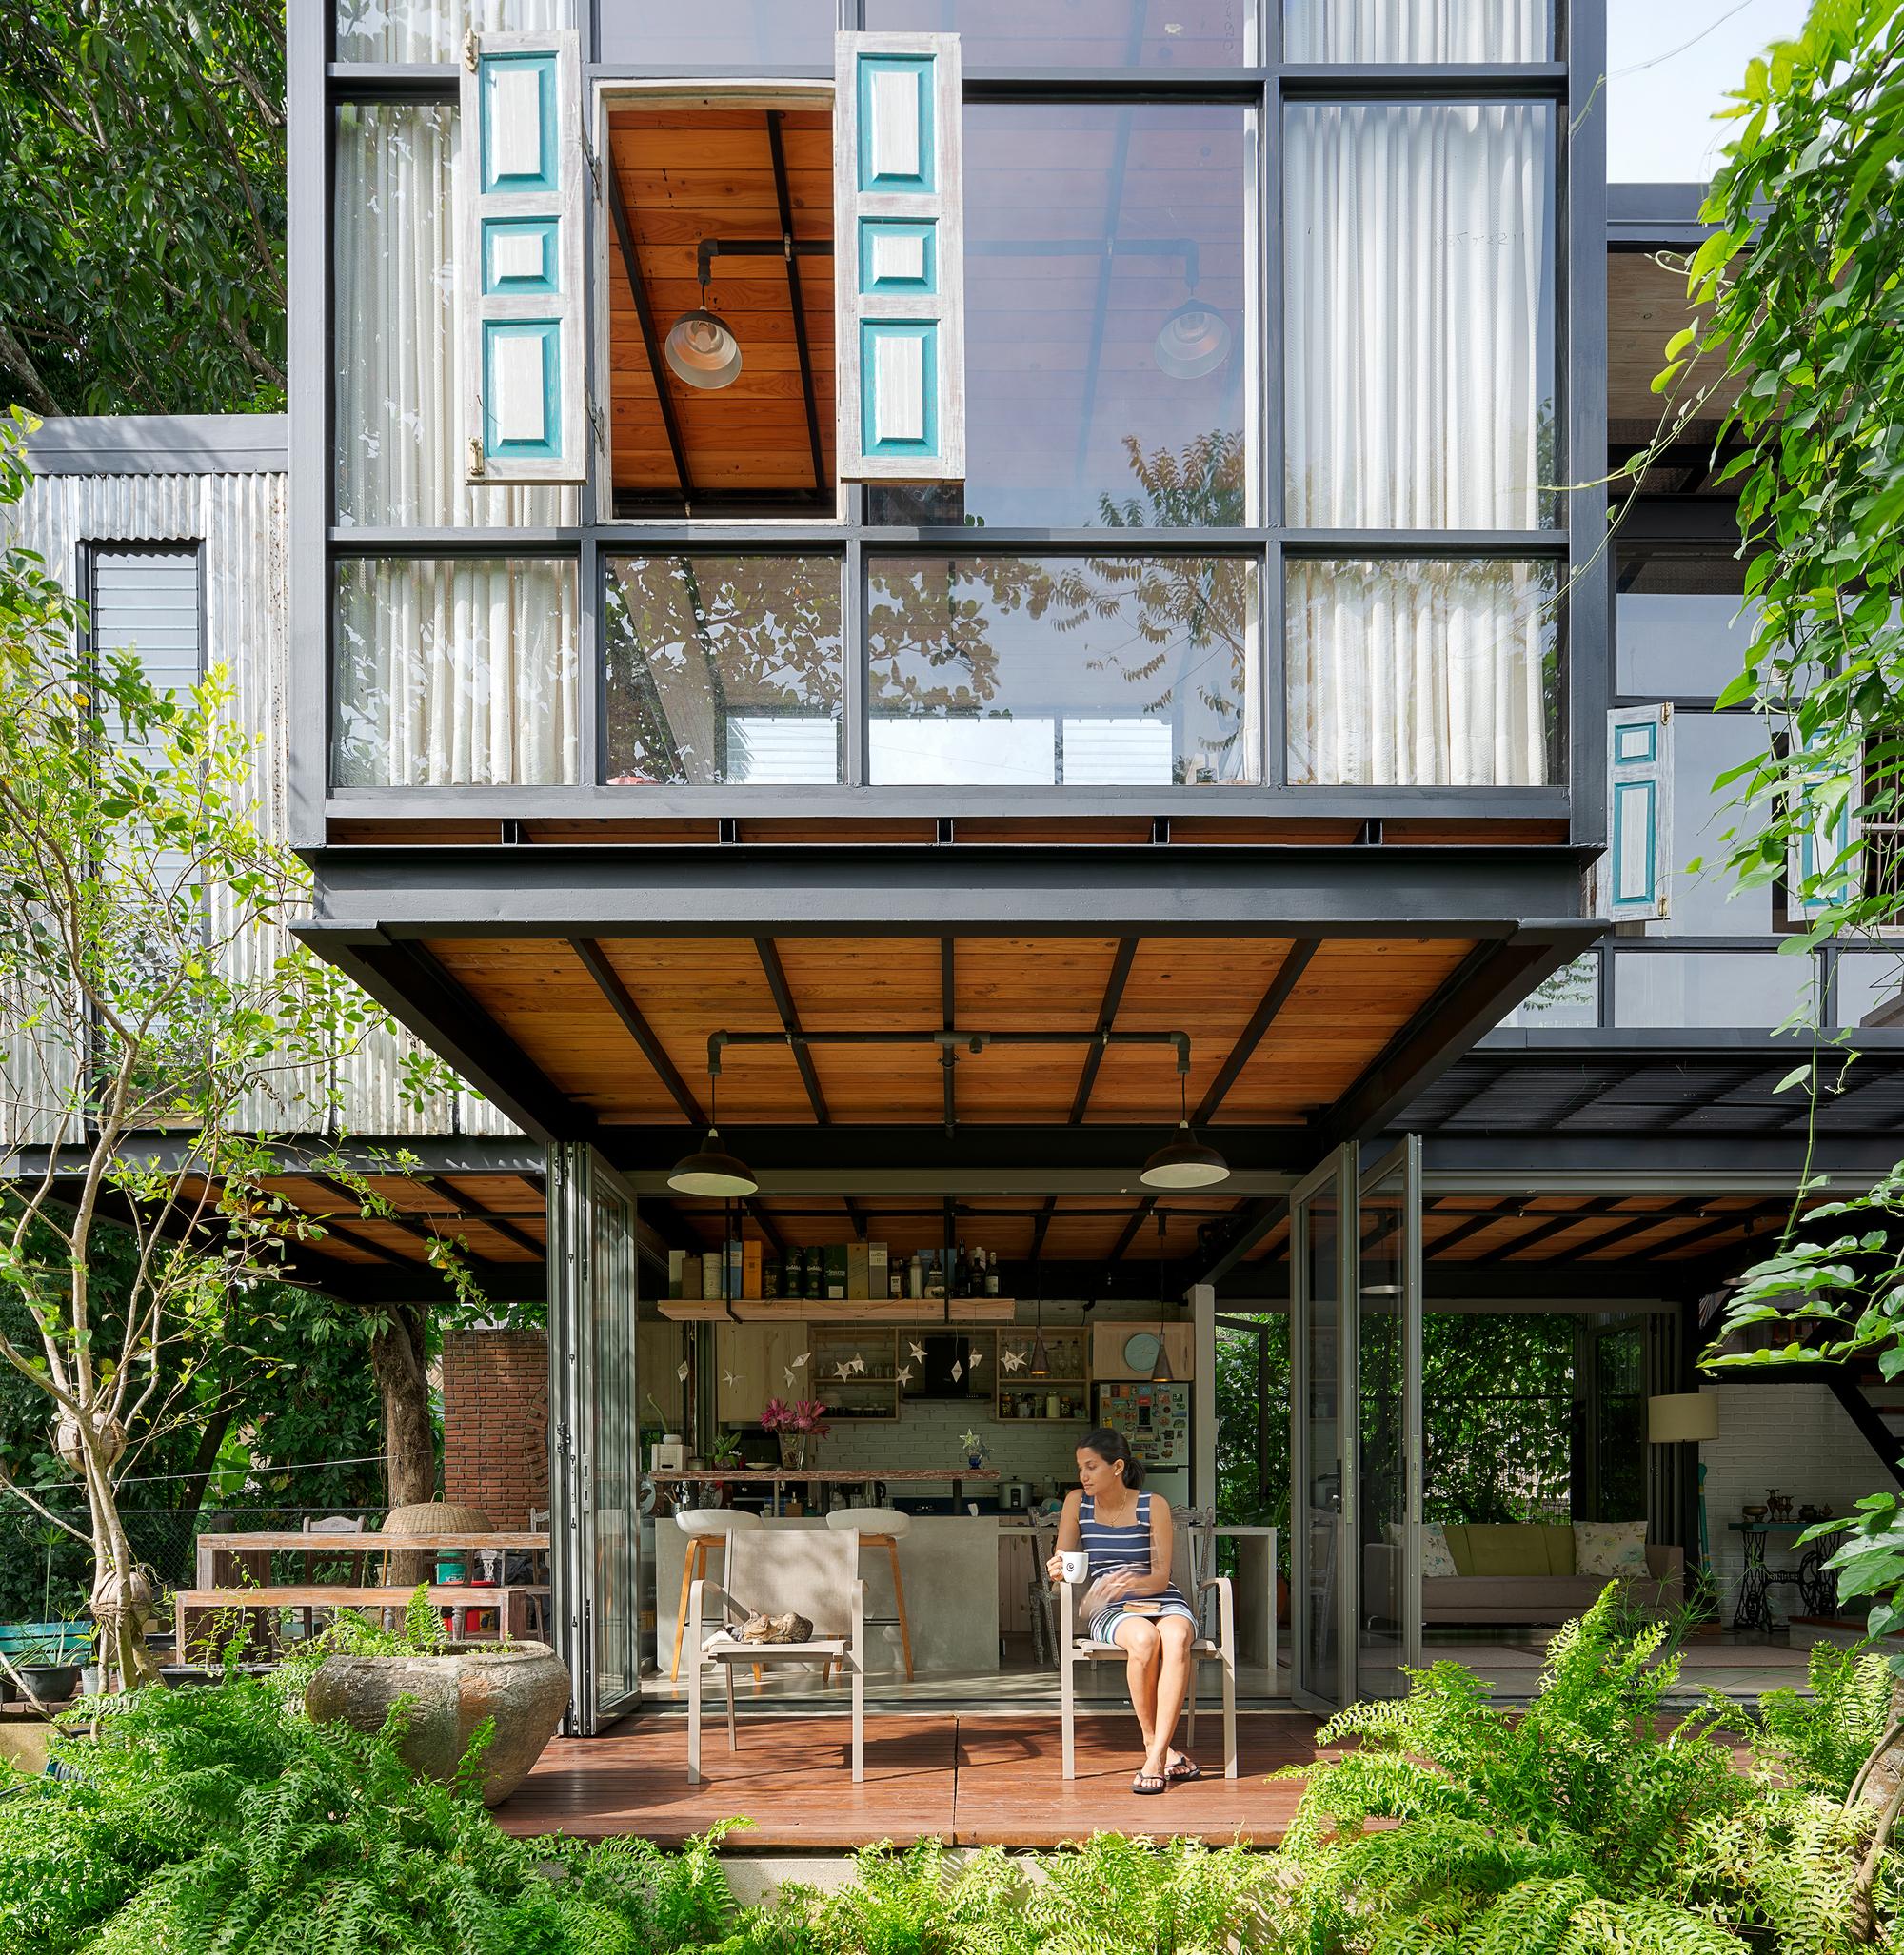 Gallery of Kozy's Canvas / KWCA - Kosala Weerasekara Chartered Architects - 1